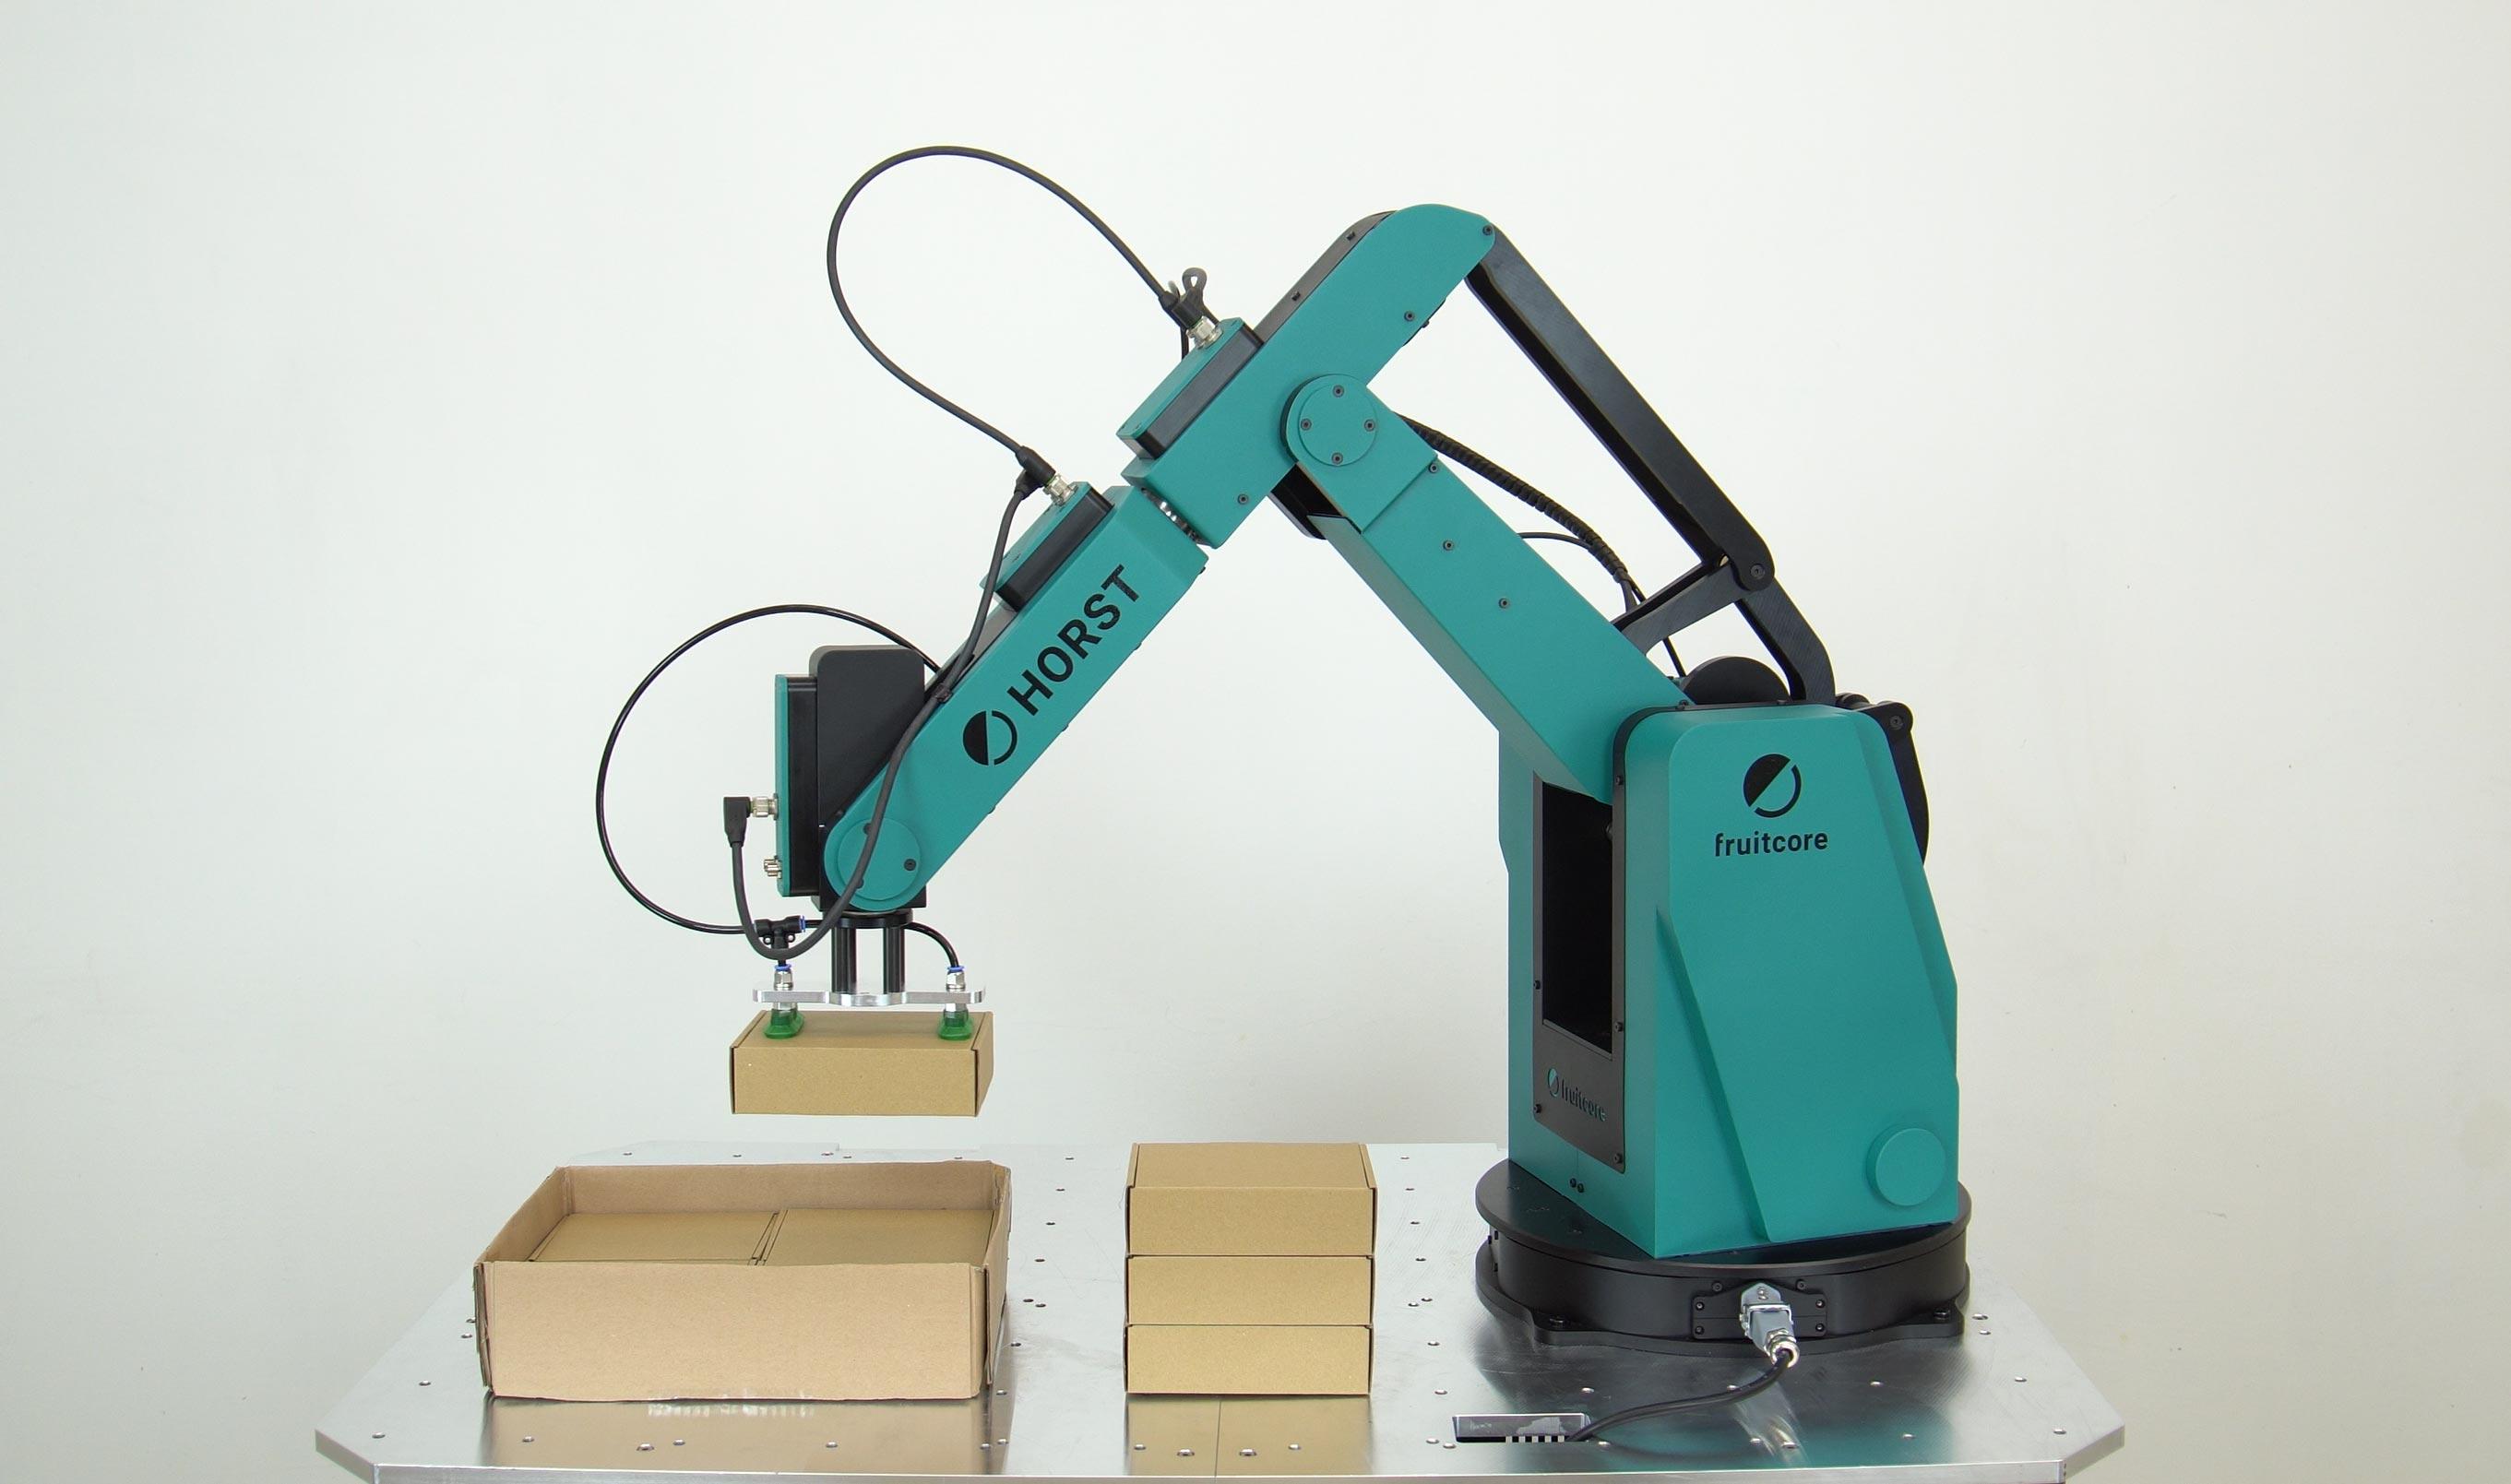 fruitcore-robotics-Stapeln